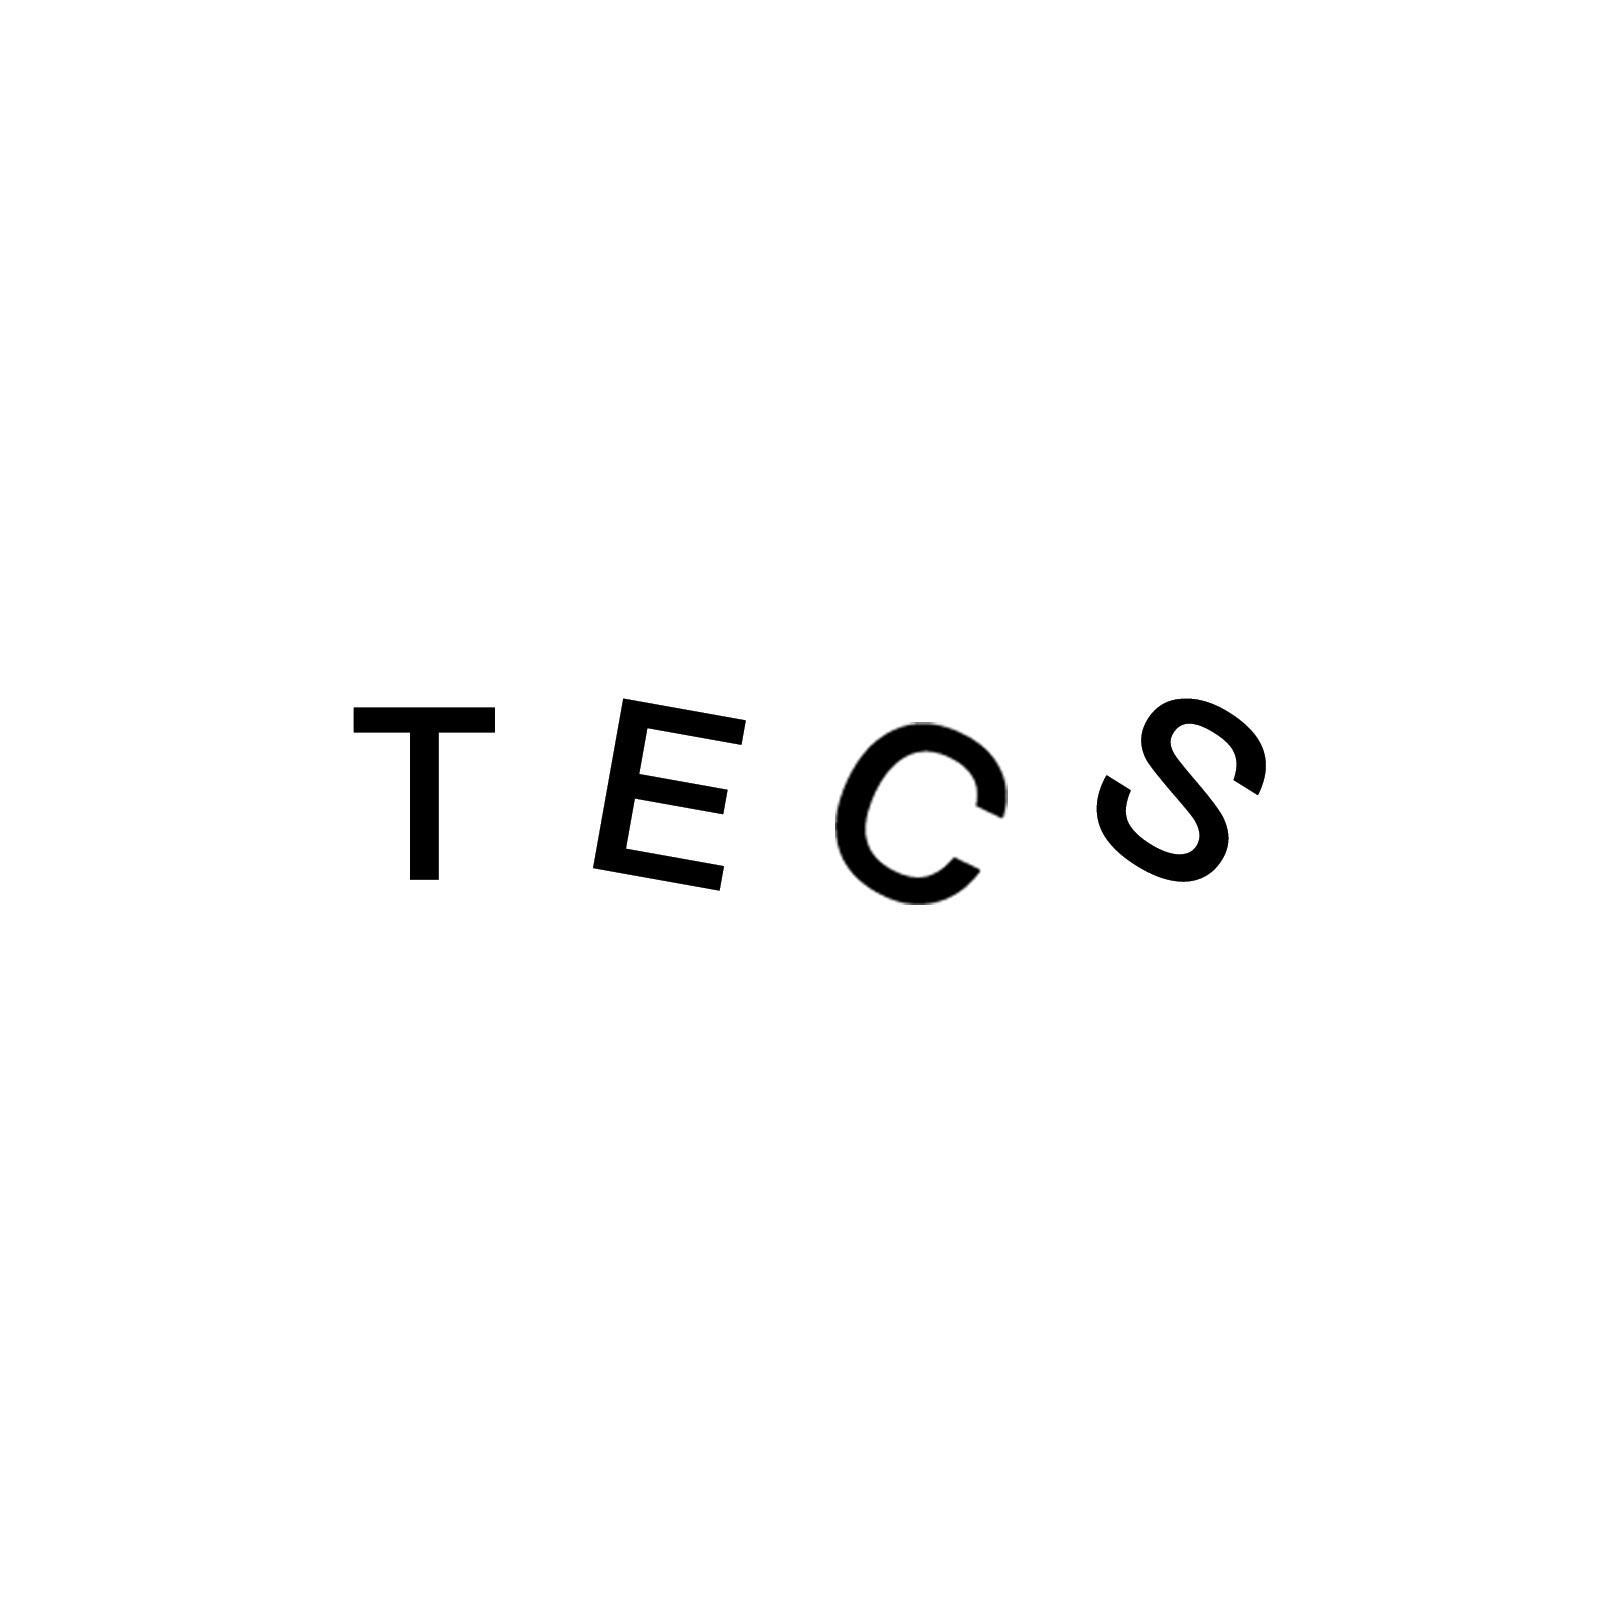 王笑恒TechsonMedia